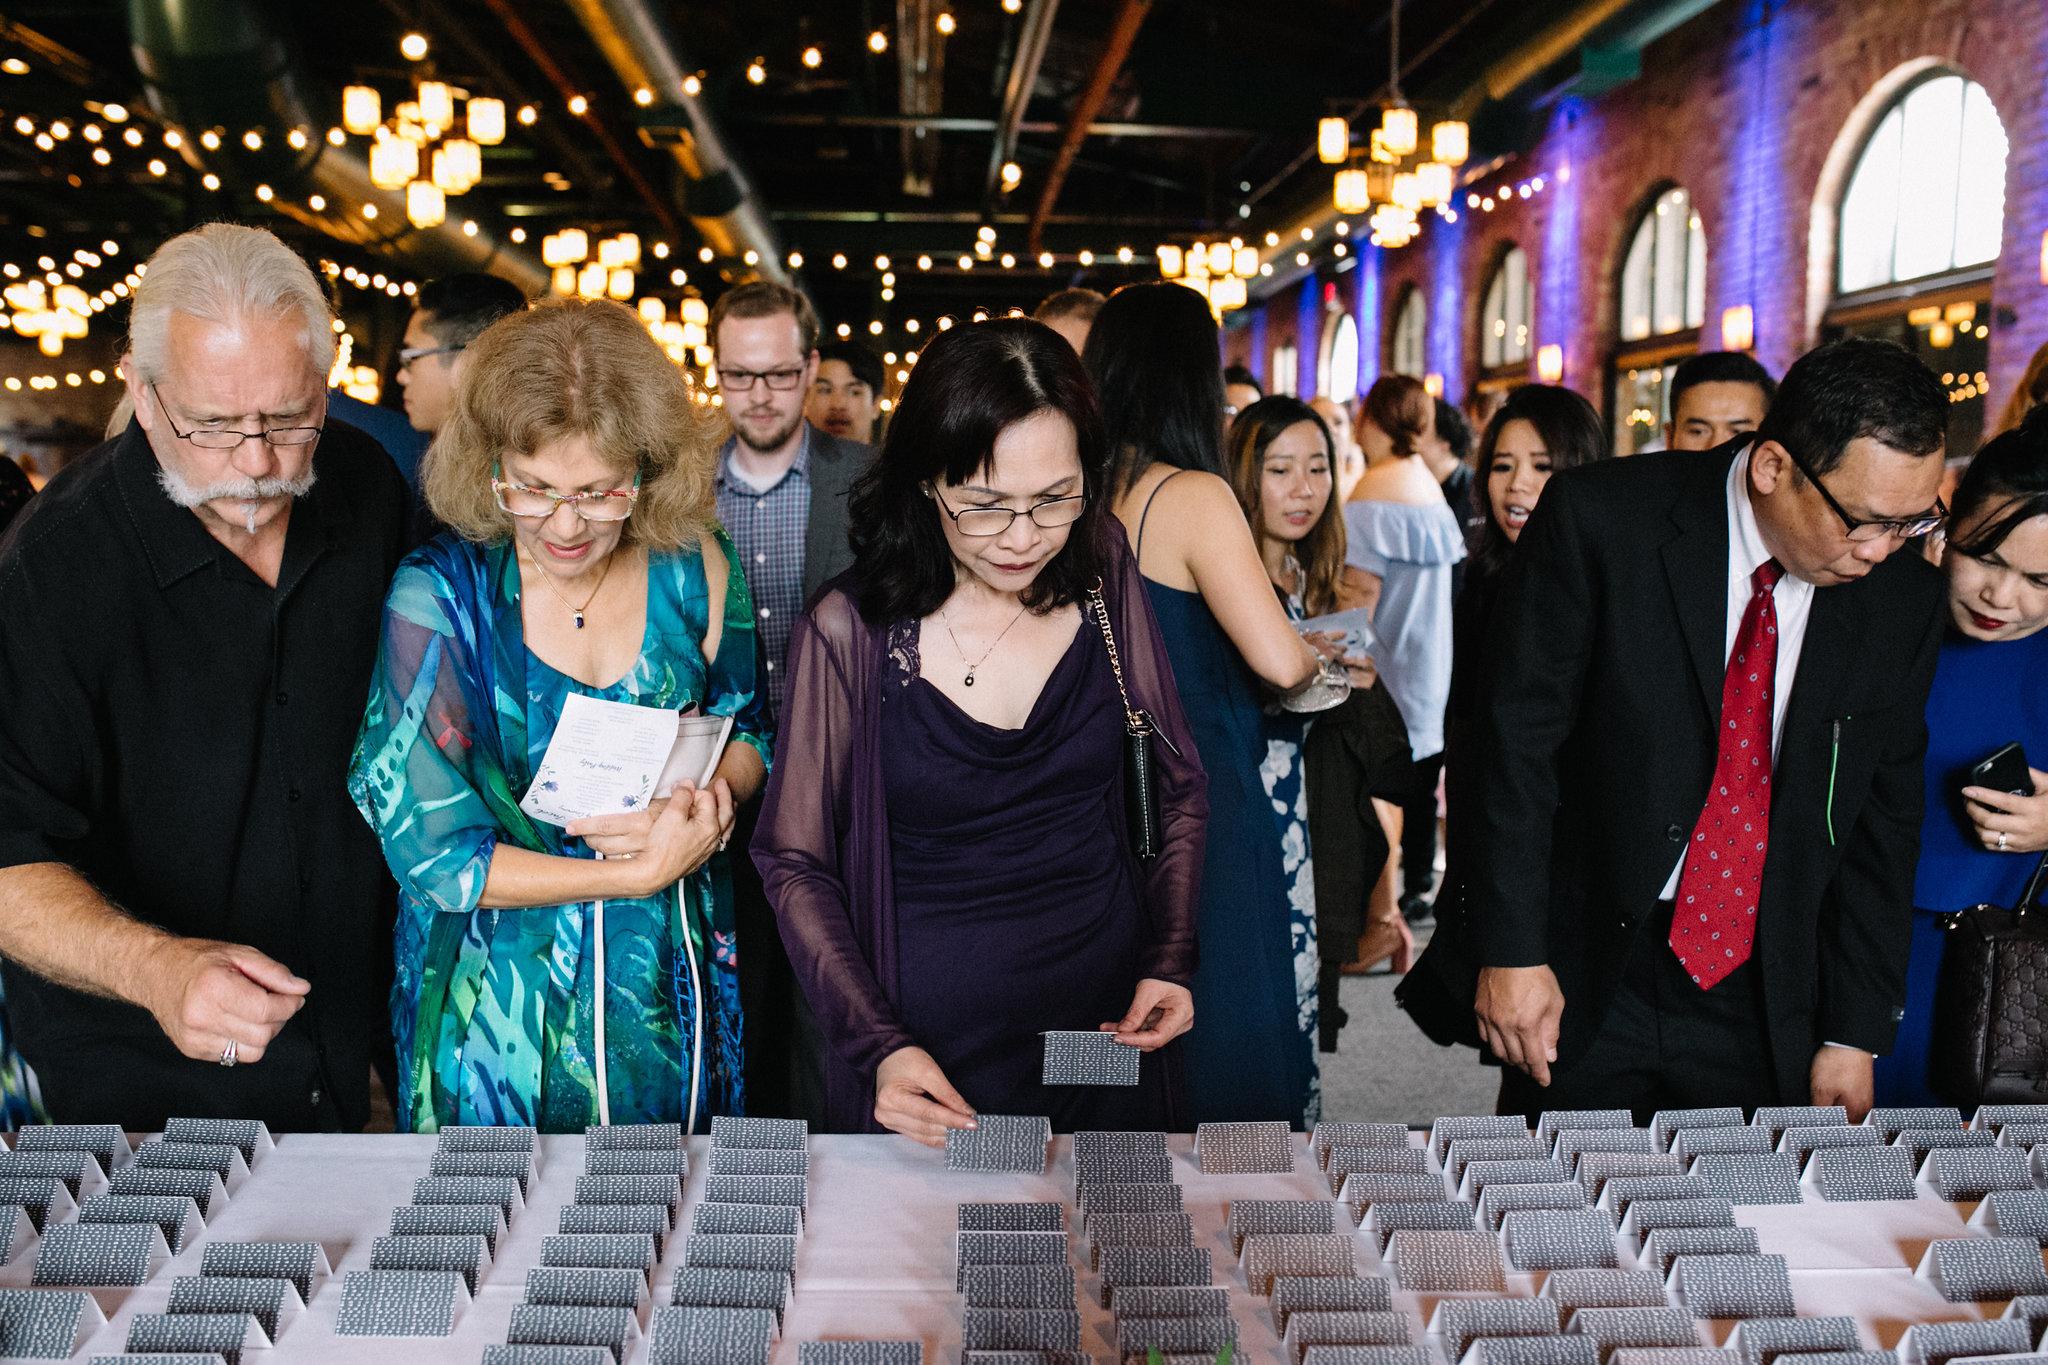 70 Whims and Joy Minneapolis photographer :: Sixpence Events & Planning Minnesota wedding planner :: Nicollet Island Pavilion.jpg